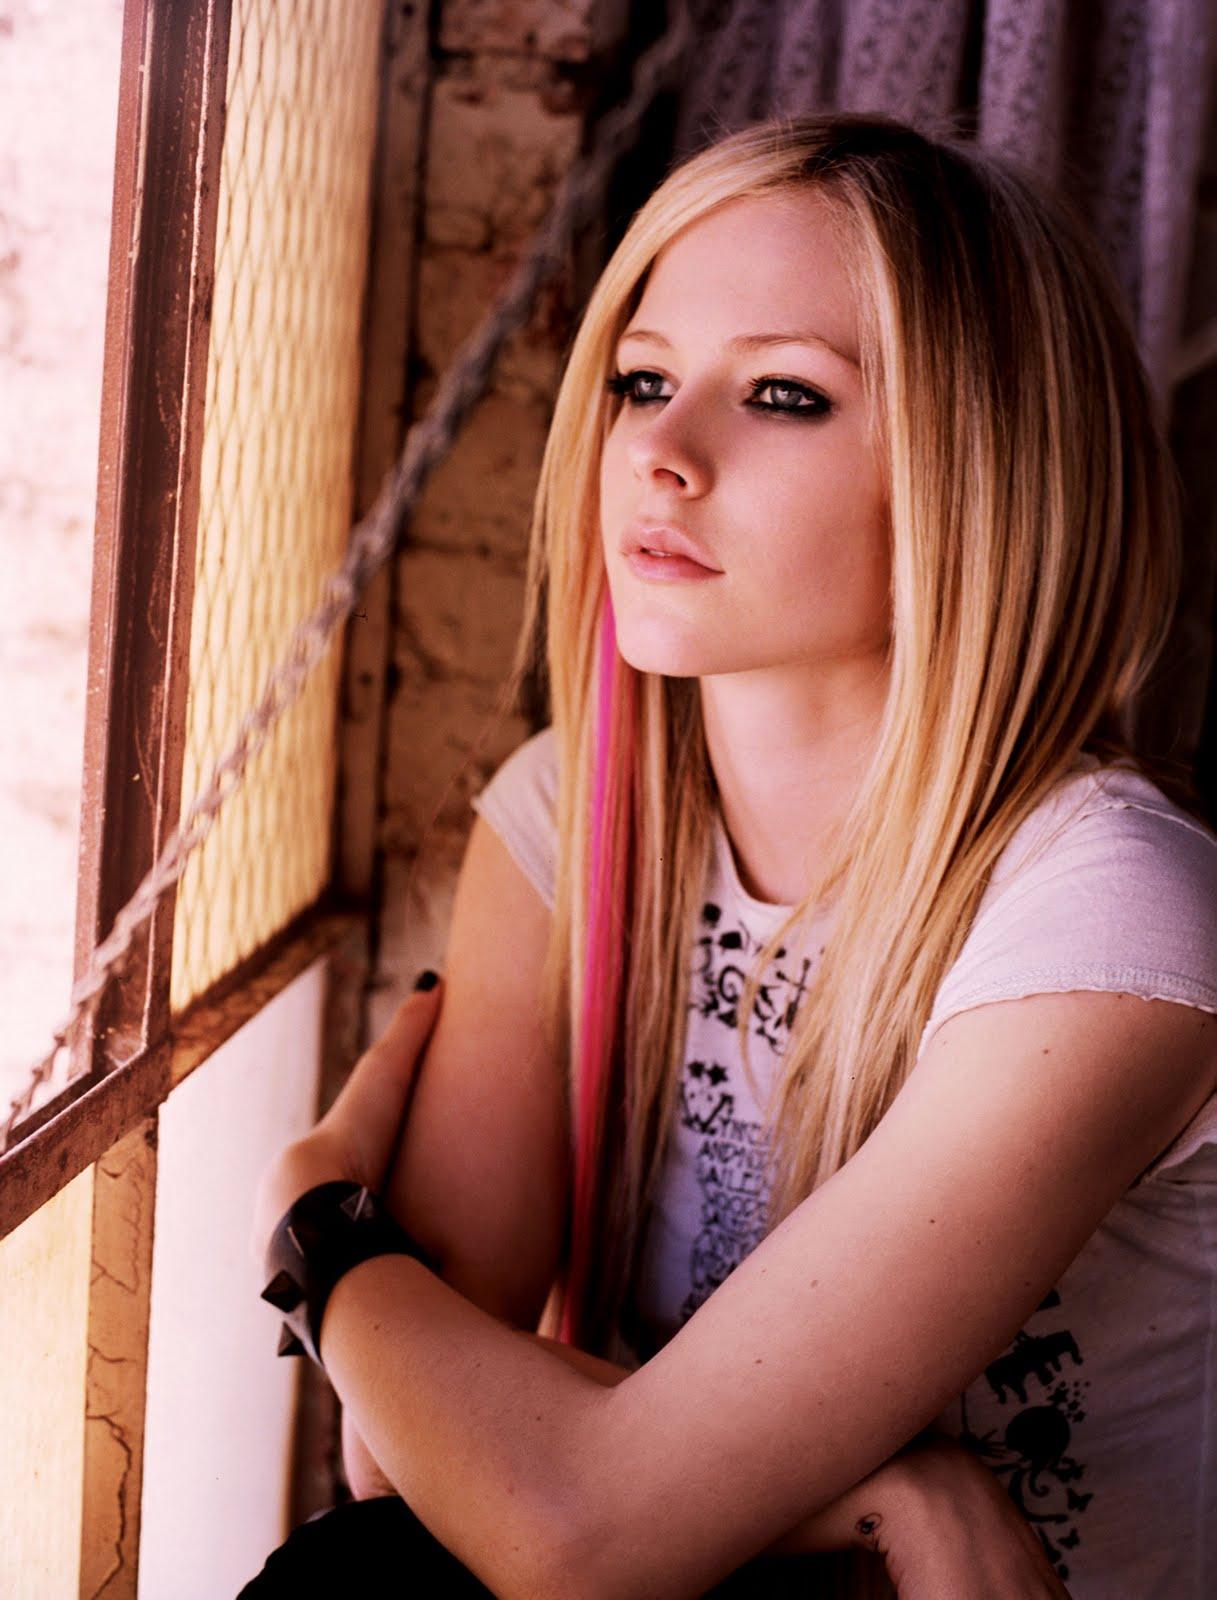 http://3.bp.blogspot.com/-M24jv8wrX98/TdGIWR7tVCI/AAAAAAAAAP0/CdqCZfYuAbw/s1600/Avril_Lavigne02364.jpg